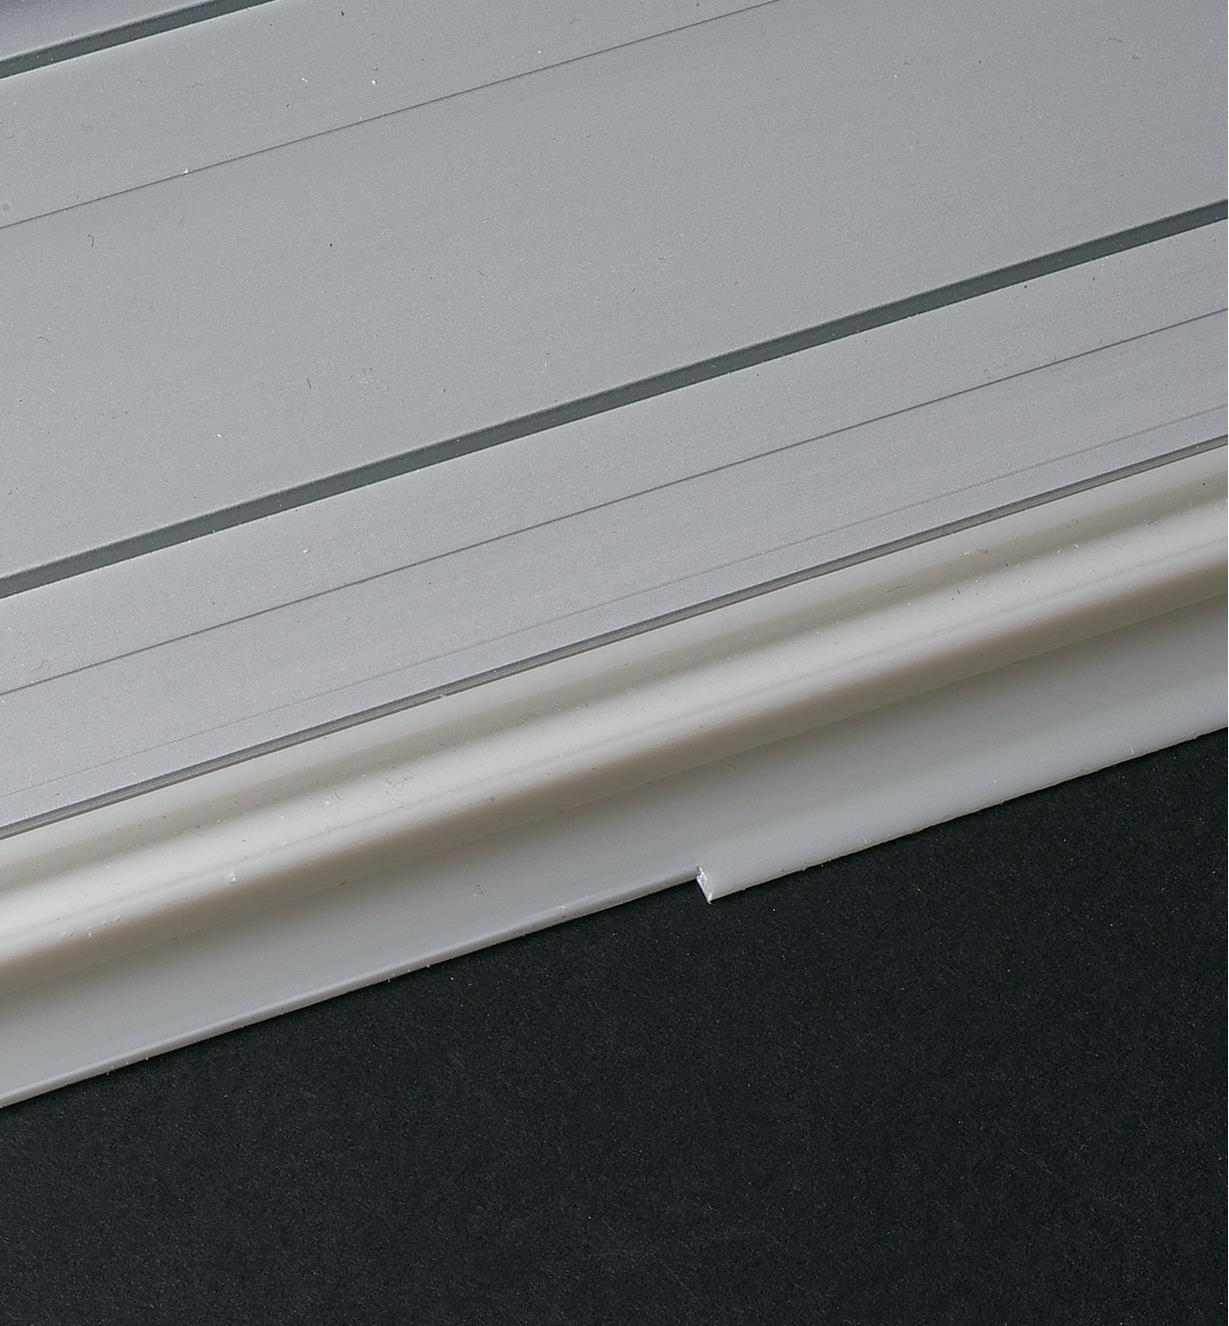 "86N5209 - EZ Smart 54"" Edging Strips, pkg. of 3"